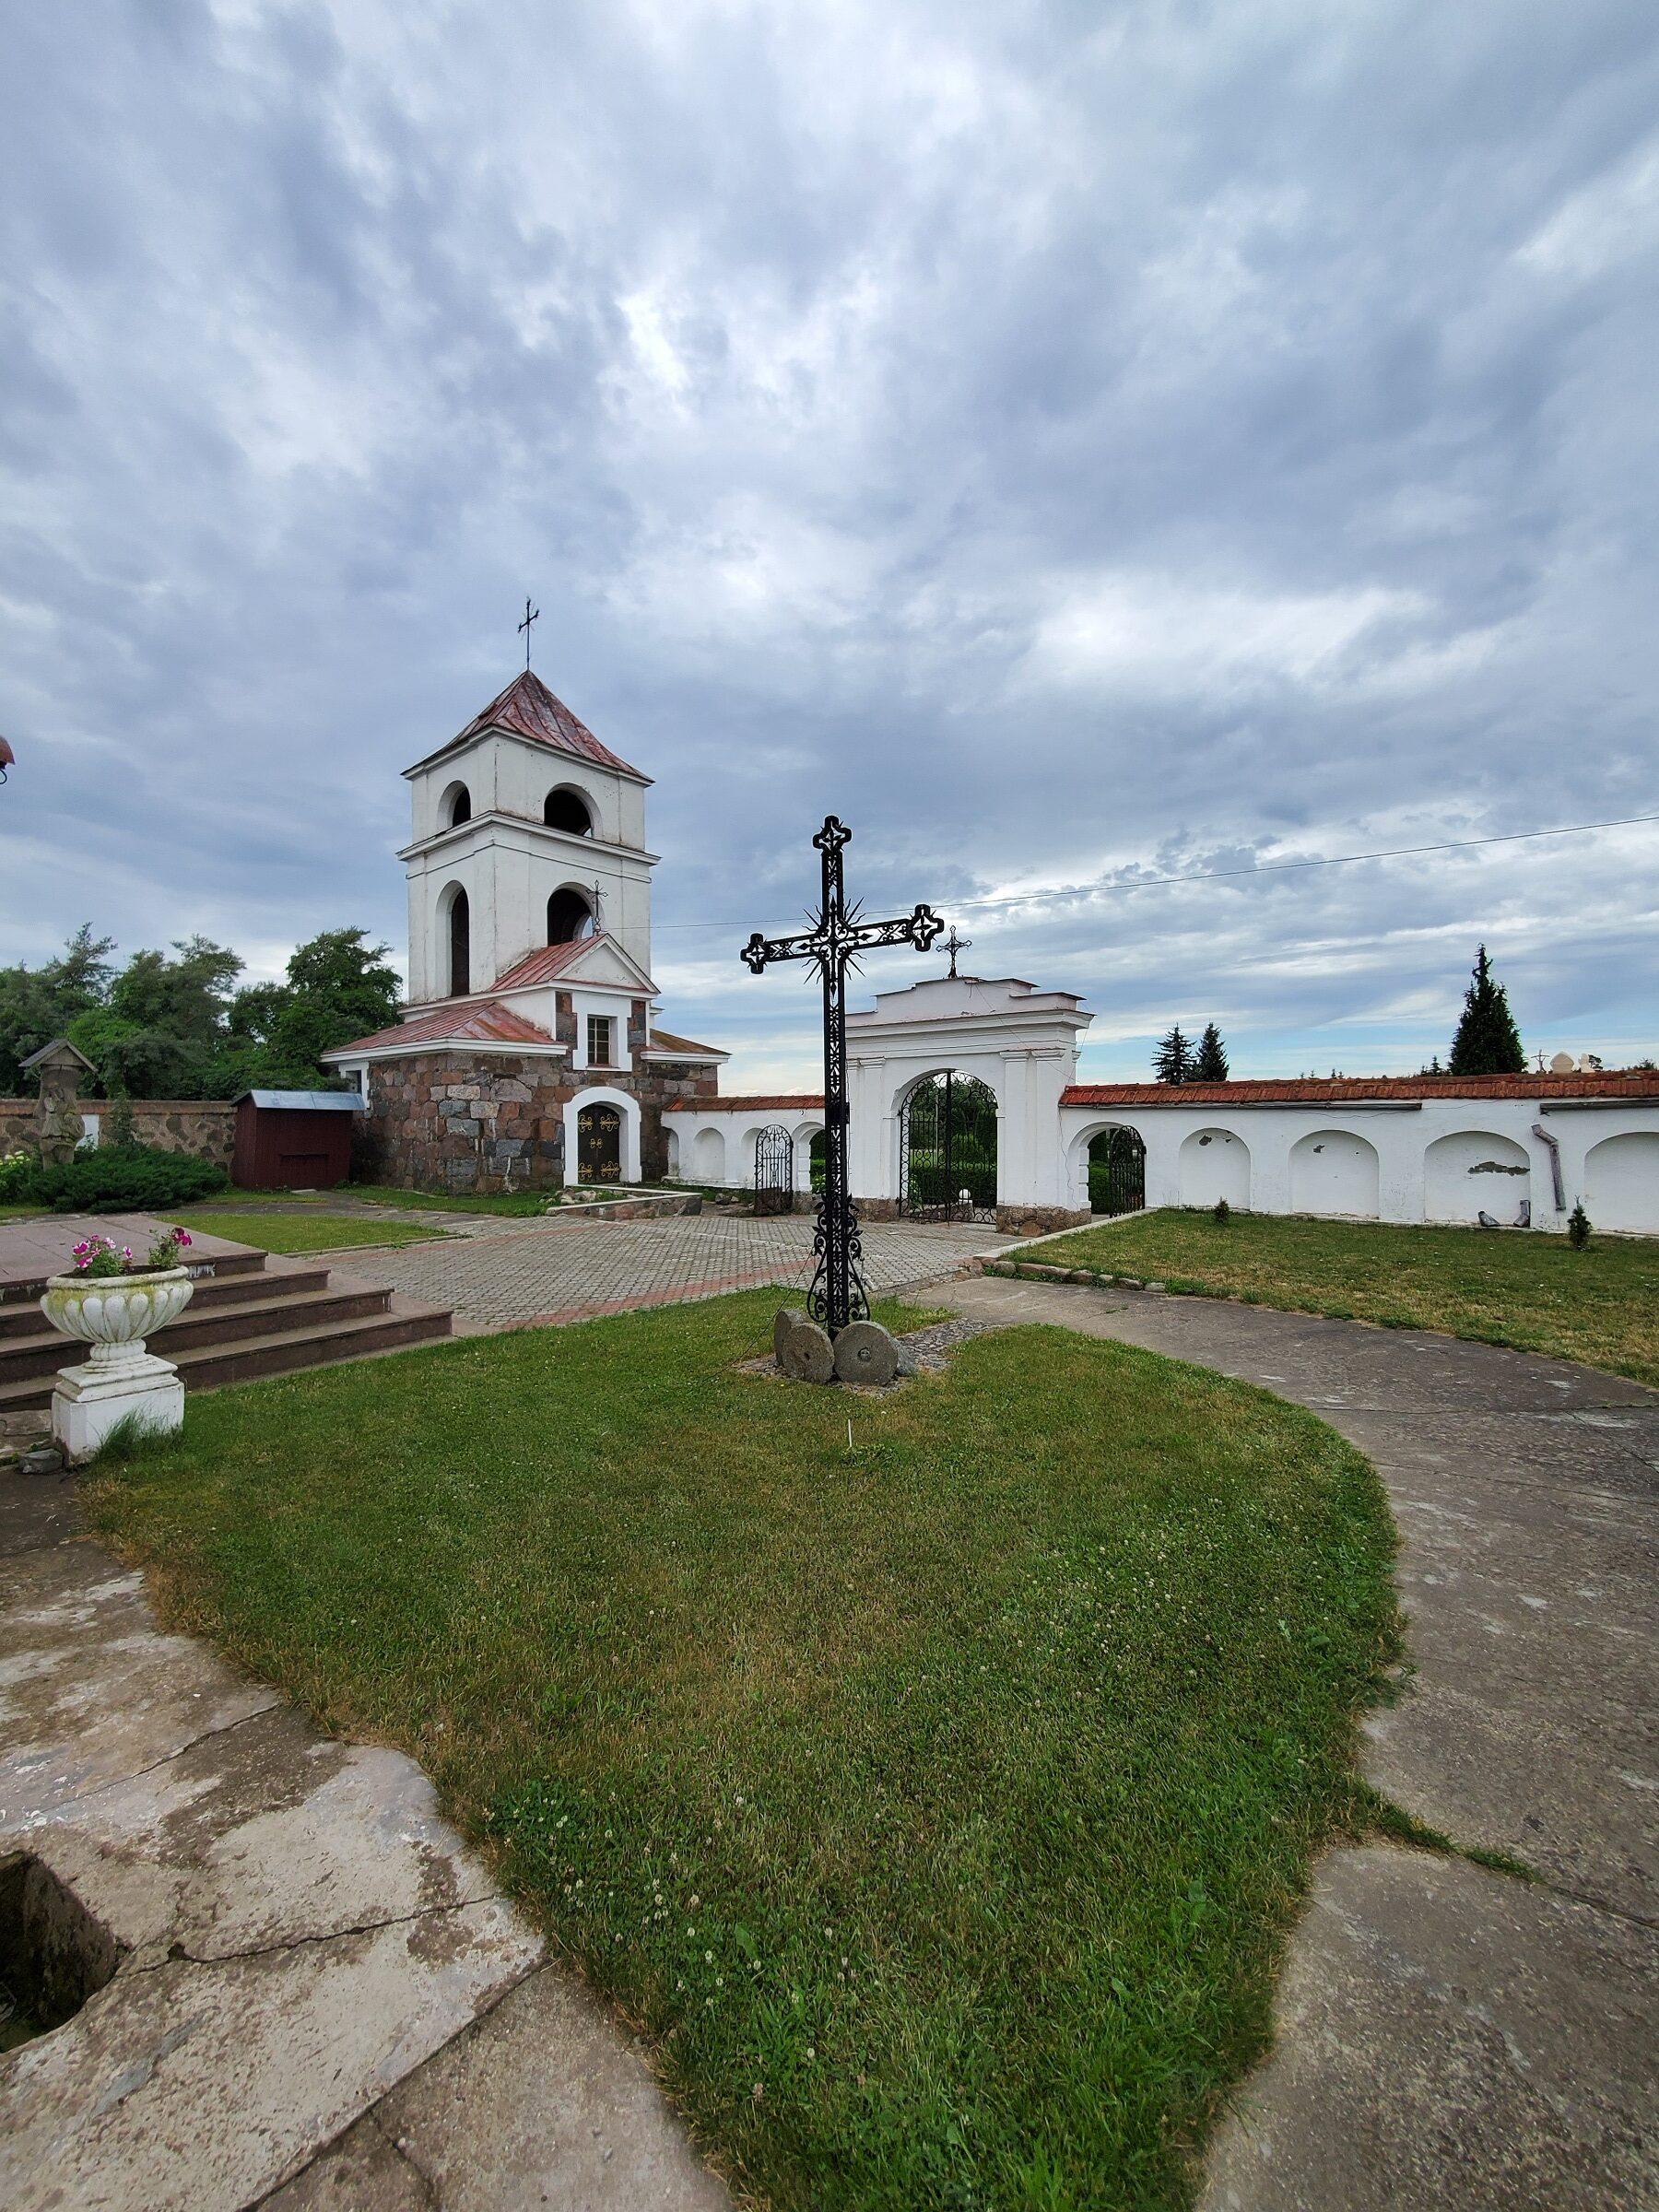 20200703 142649 1 rotated - Костел Святой Анны в деревне Мосар